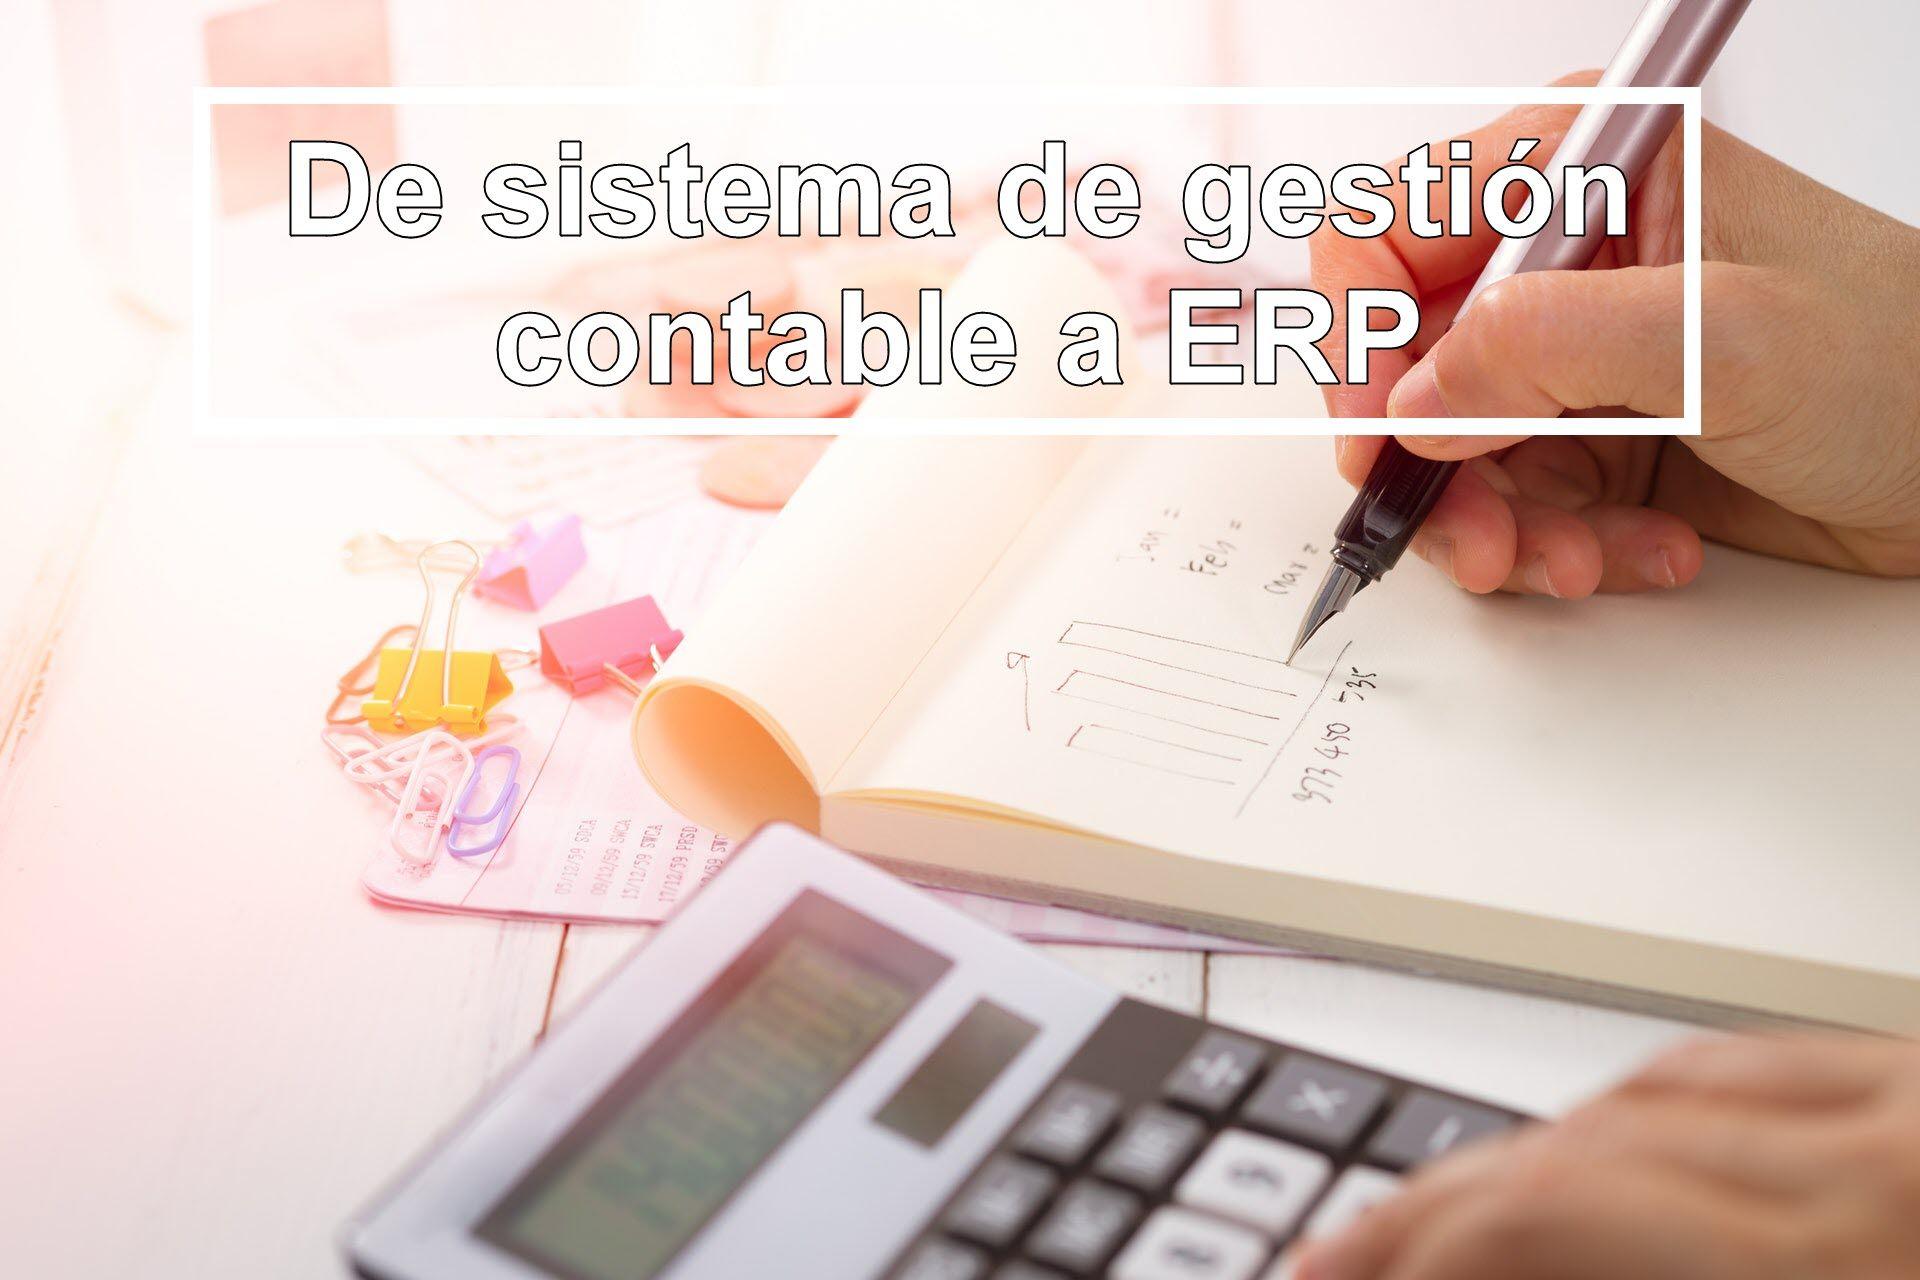 De sistema de gestión contable a ERP